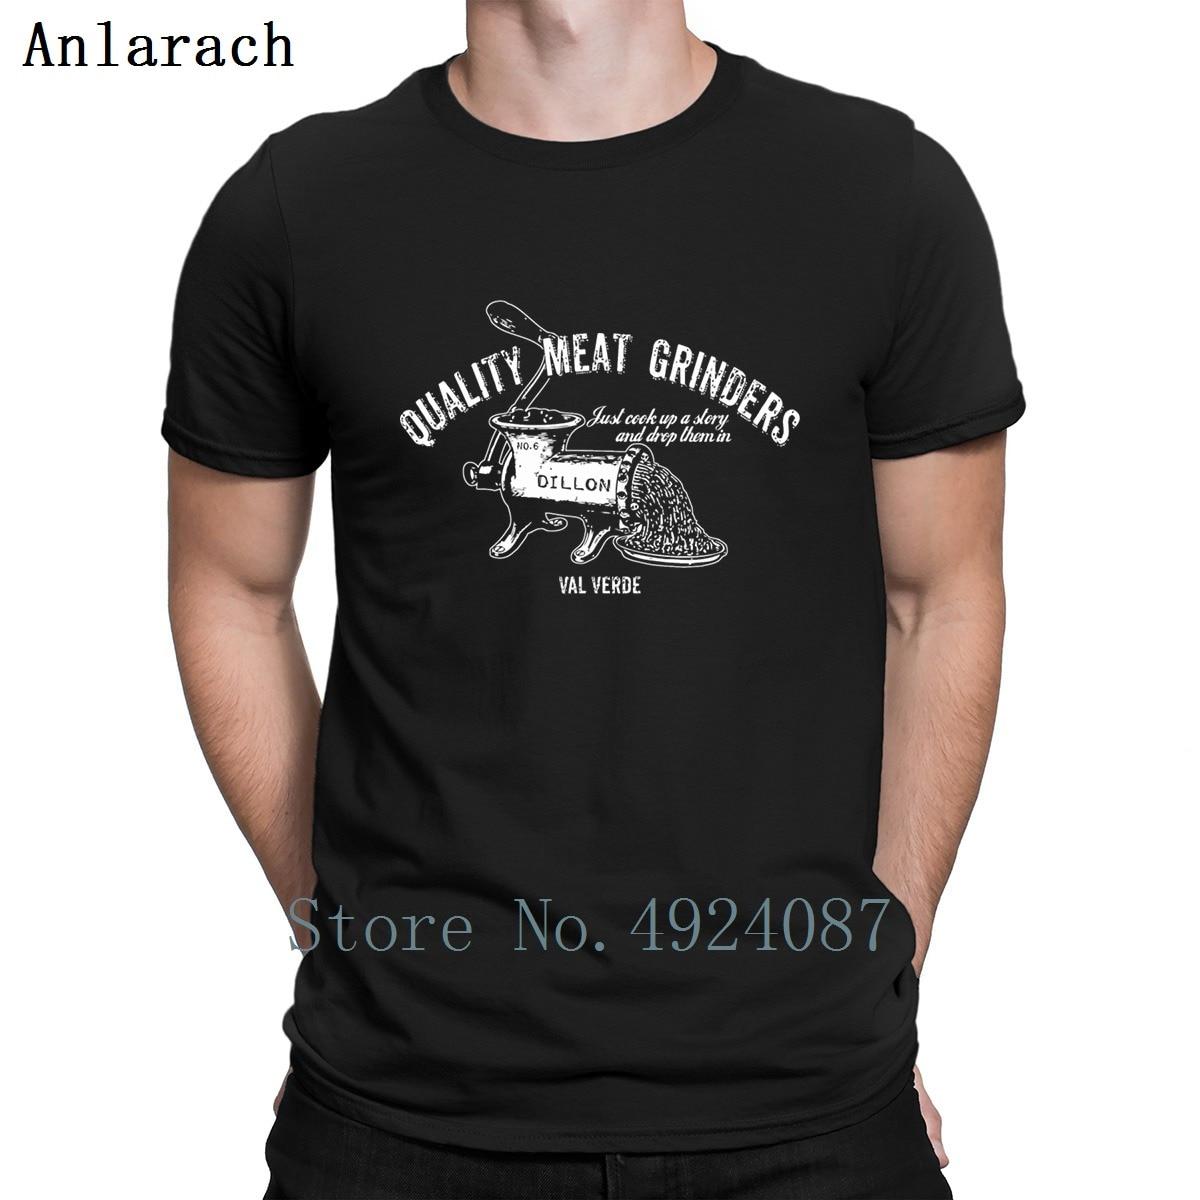 Camiseta Predator Dillon con estampado de carne para hombre, Camiseta de algodón interesante para hombre, camiseta creativa ajustada de verano auténtica